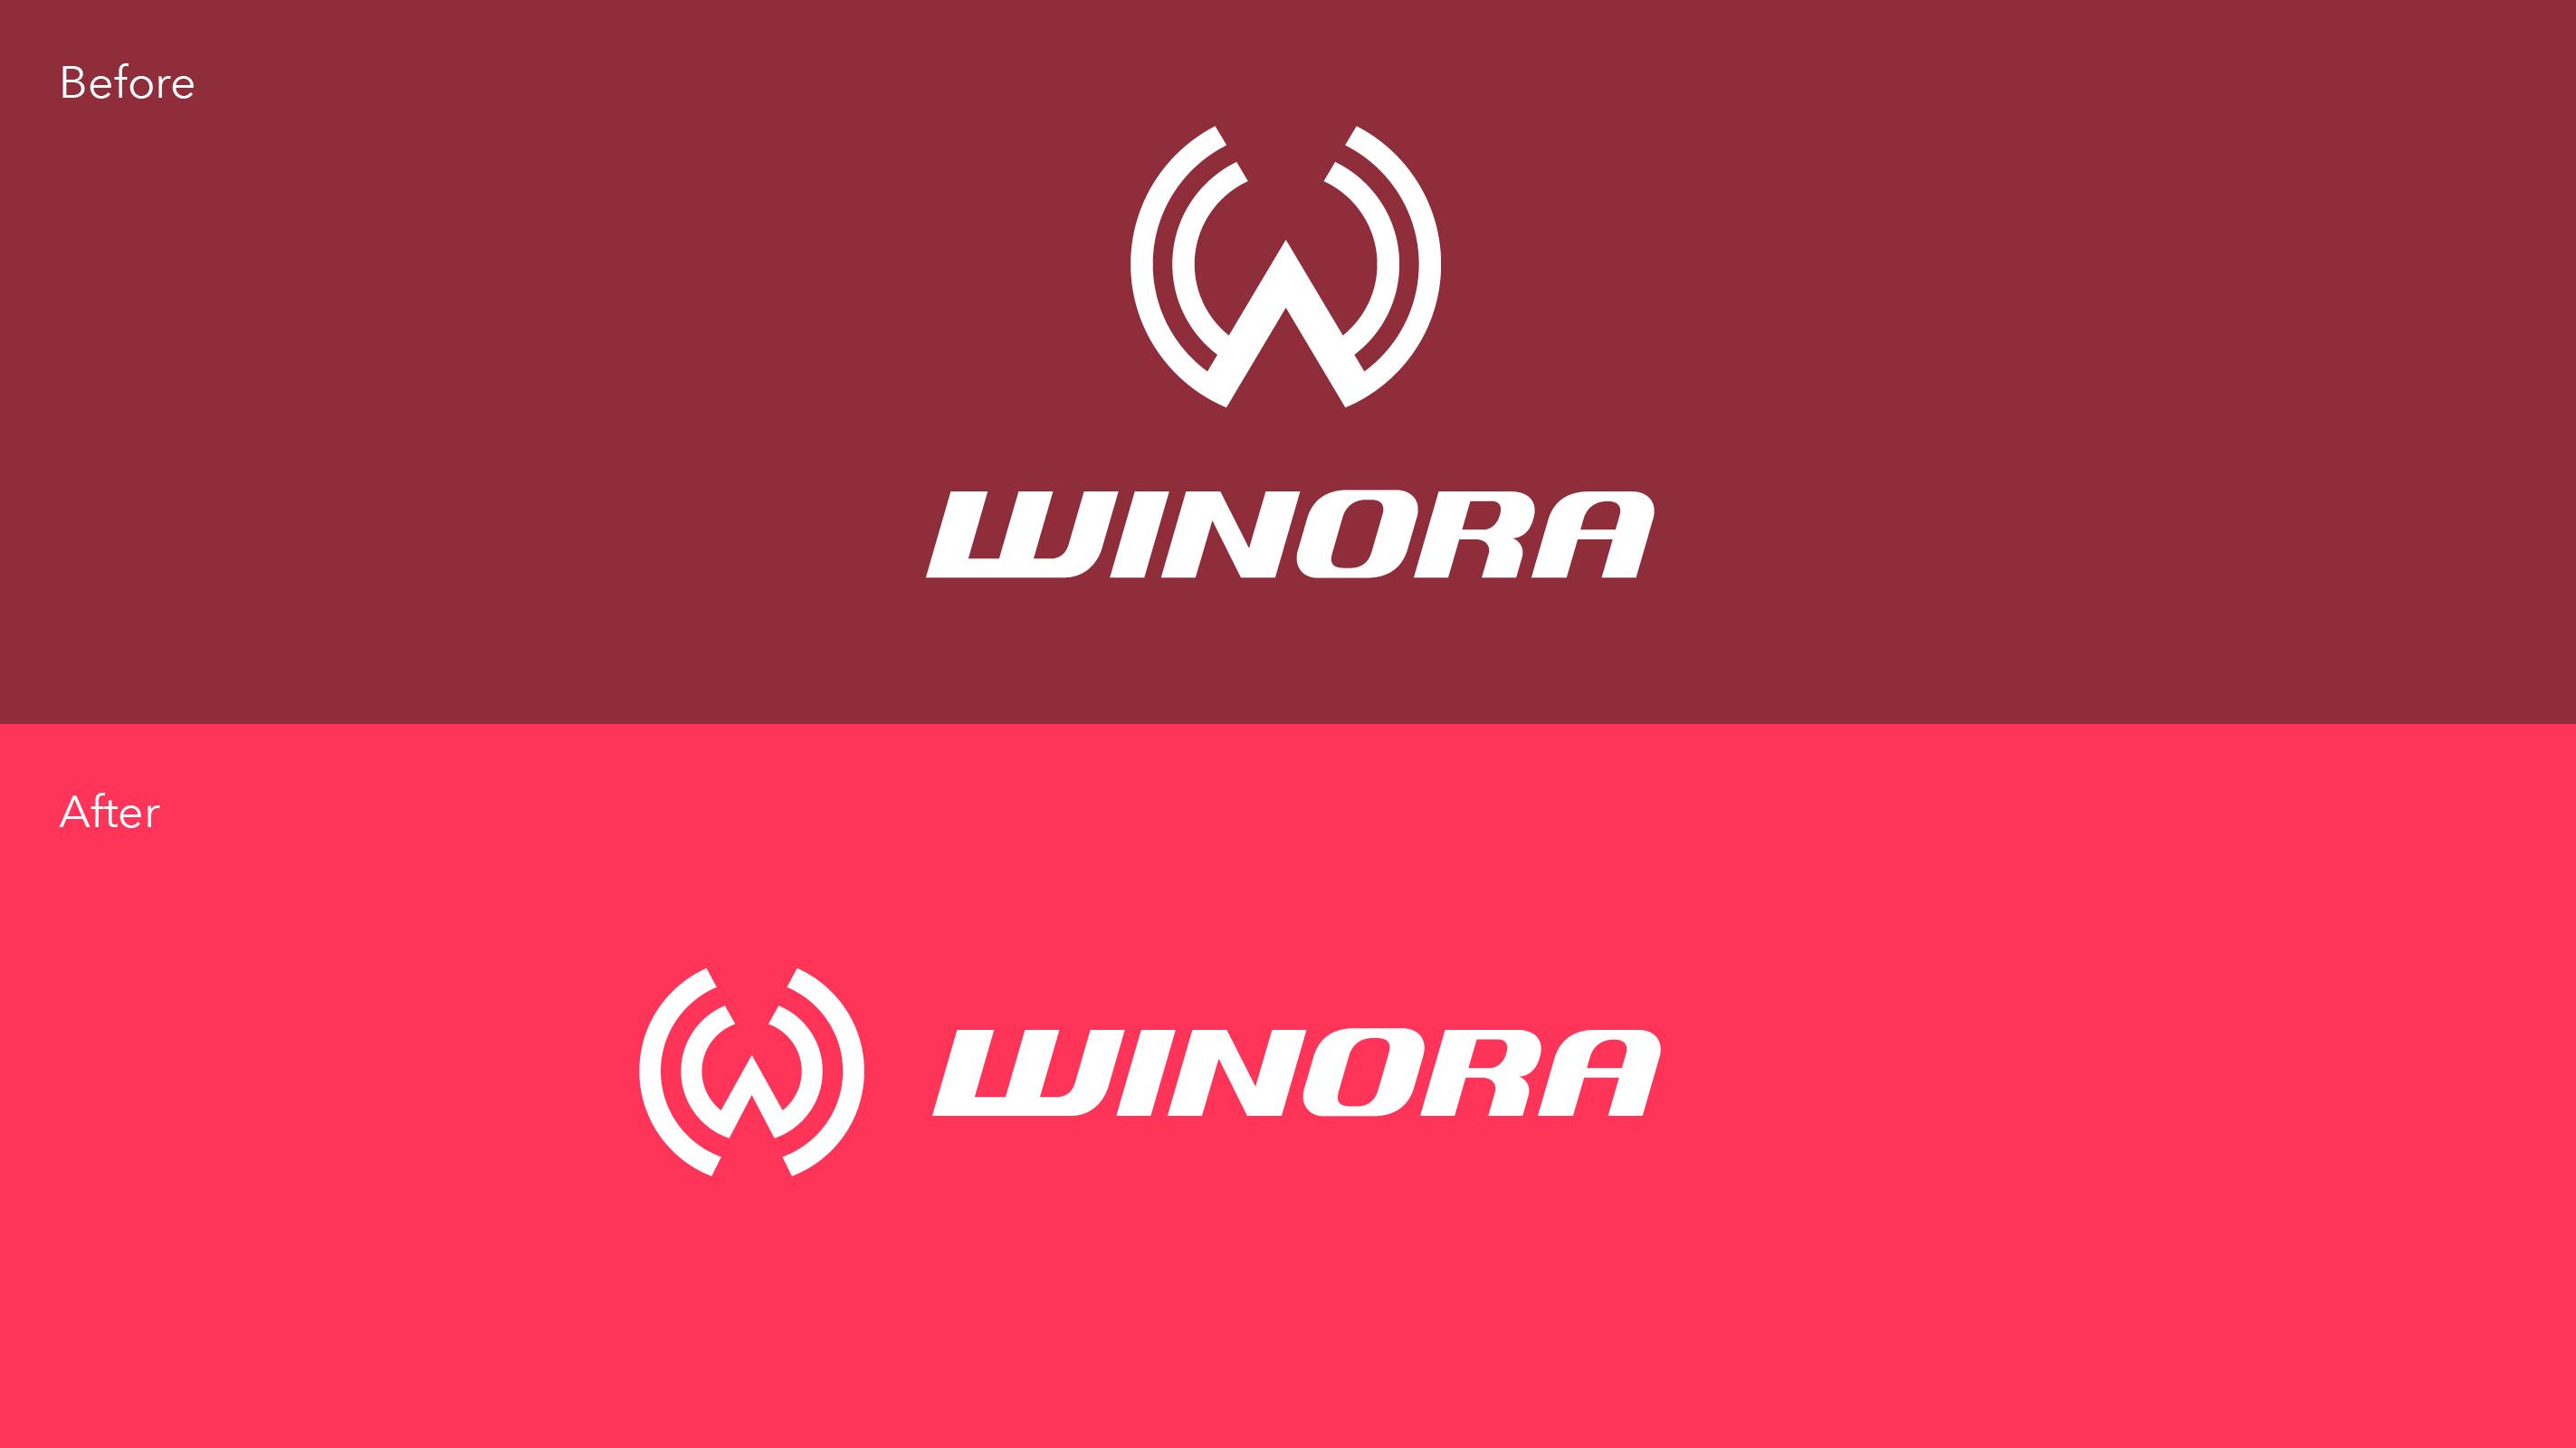 Winora Logo Evolution – Poarangan Brand Design